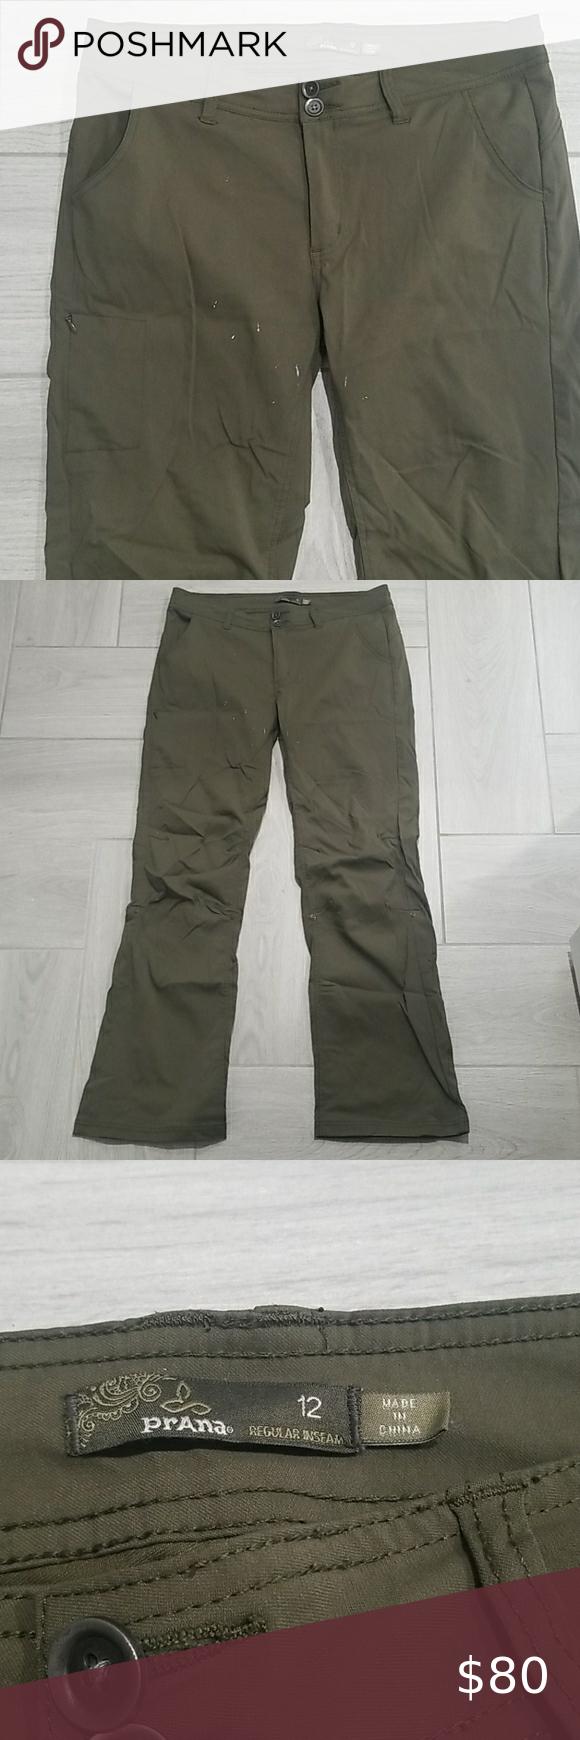 HP💕 PrAna • RARE Utility Safari Pants, Size 12